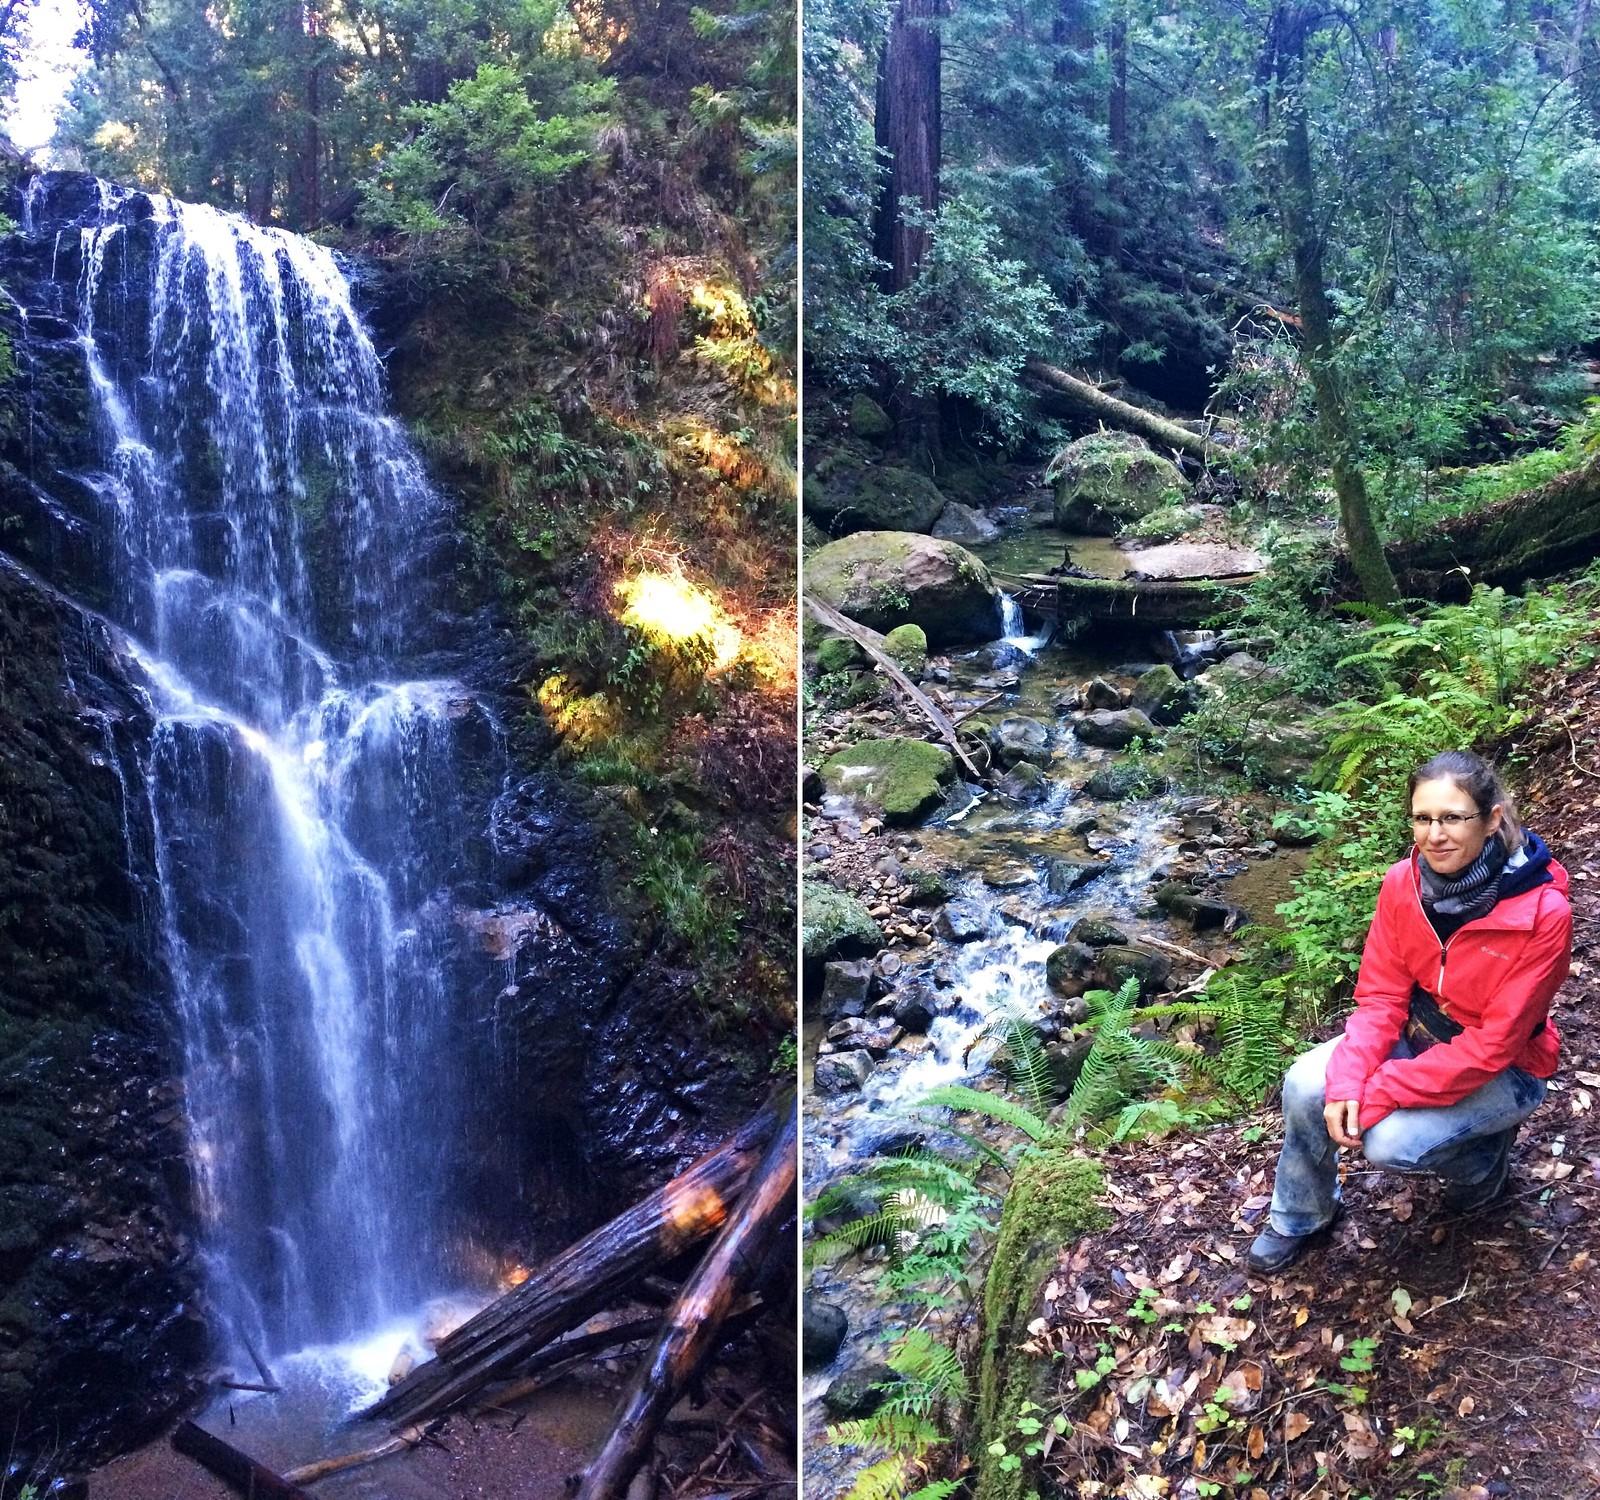 Big Basin Redwoods State Park, California, USA